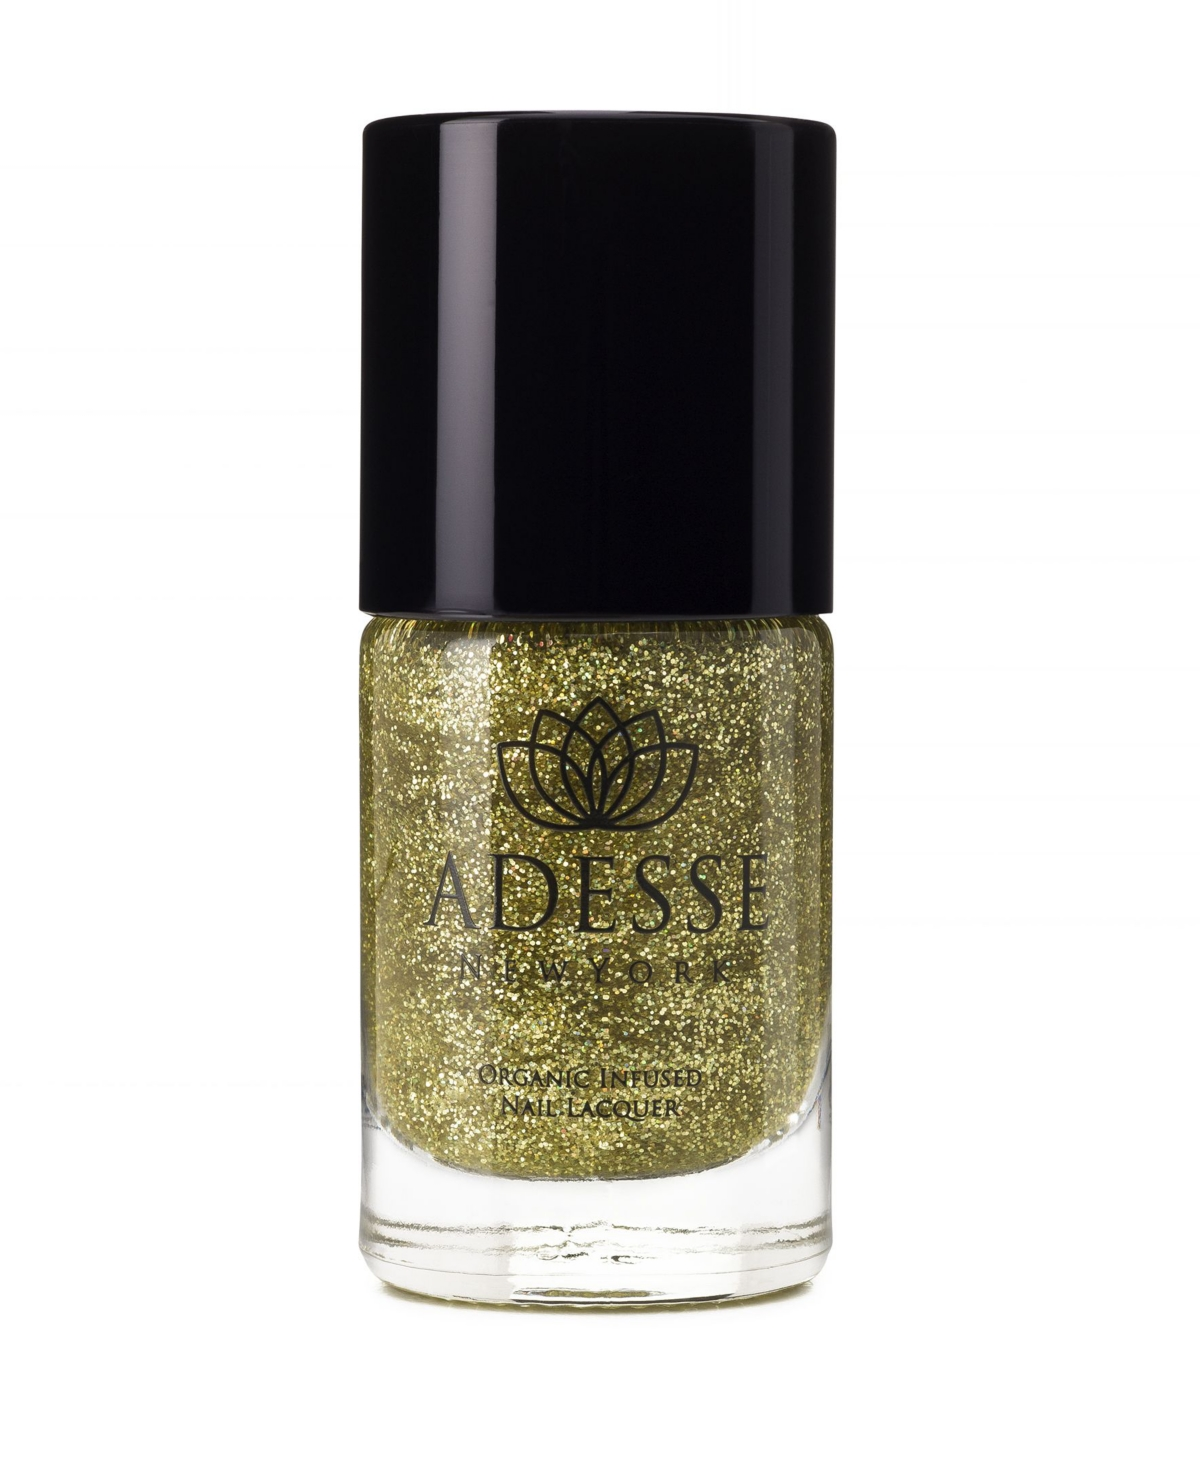 Adesse New York Glitter Nail Polish